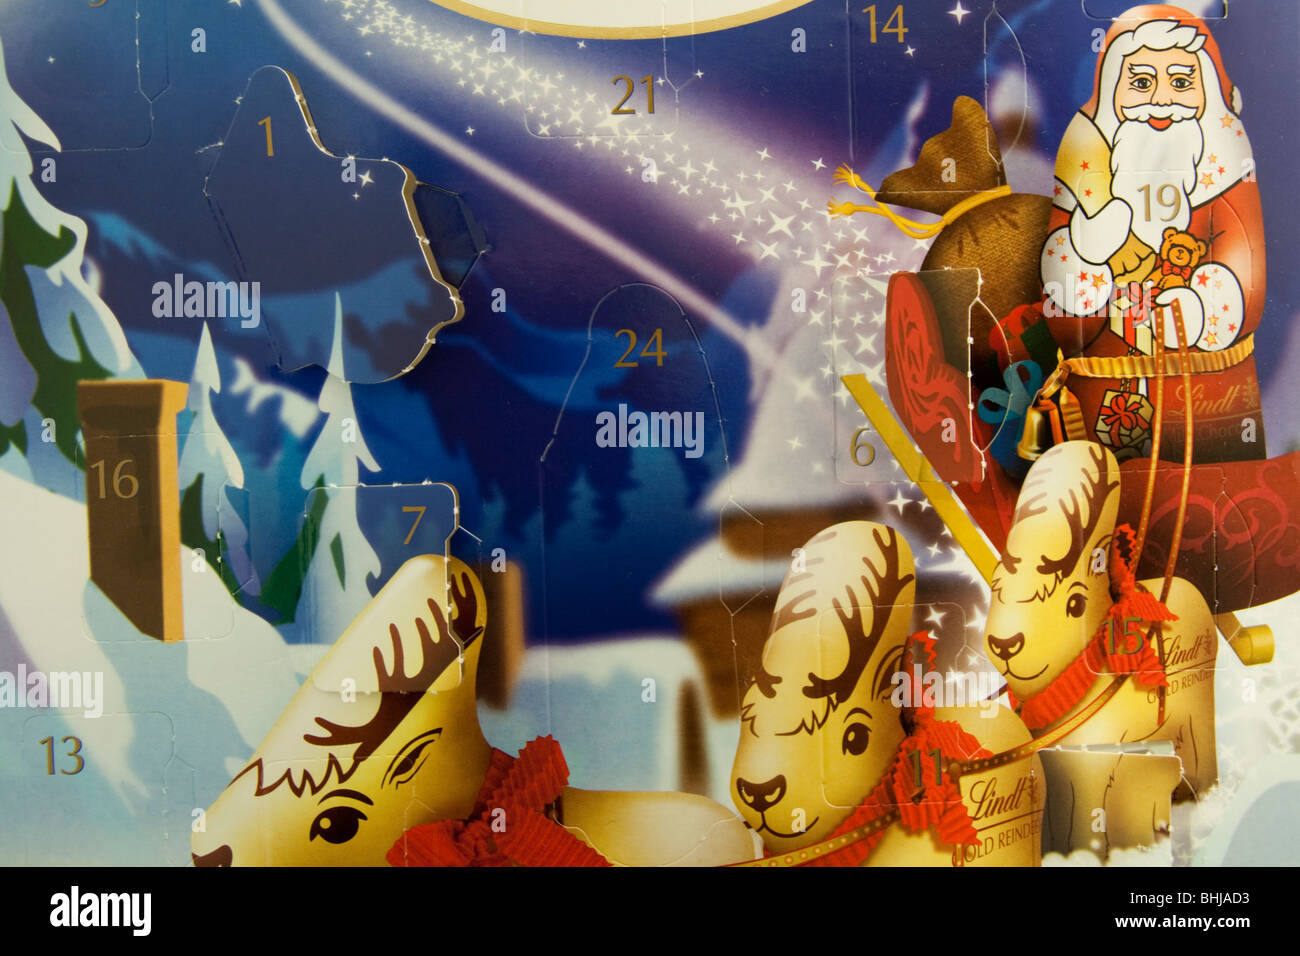 Lindt chocolate Advent Calendar - Stock Image